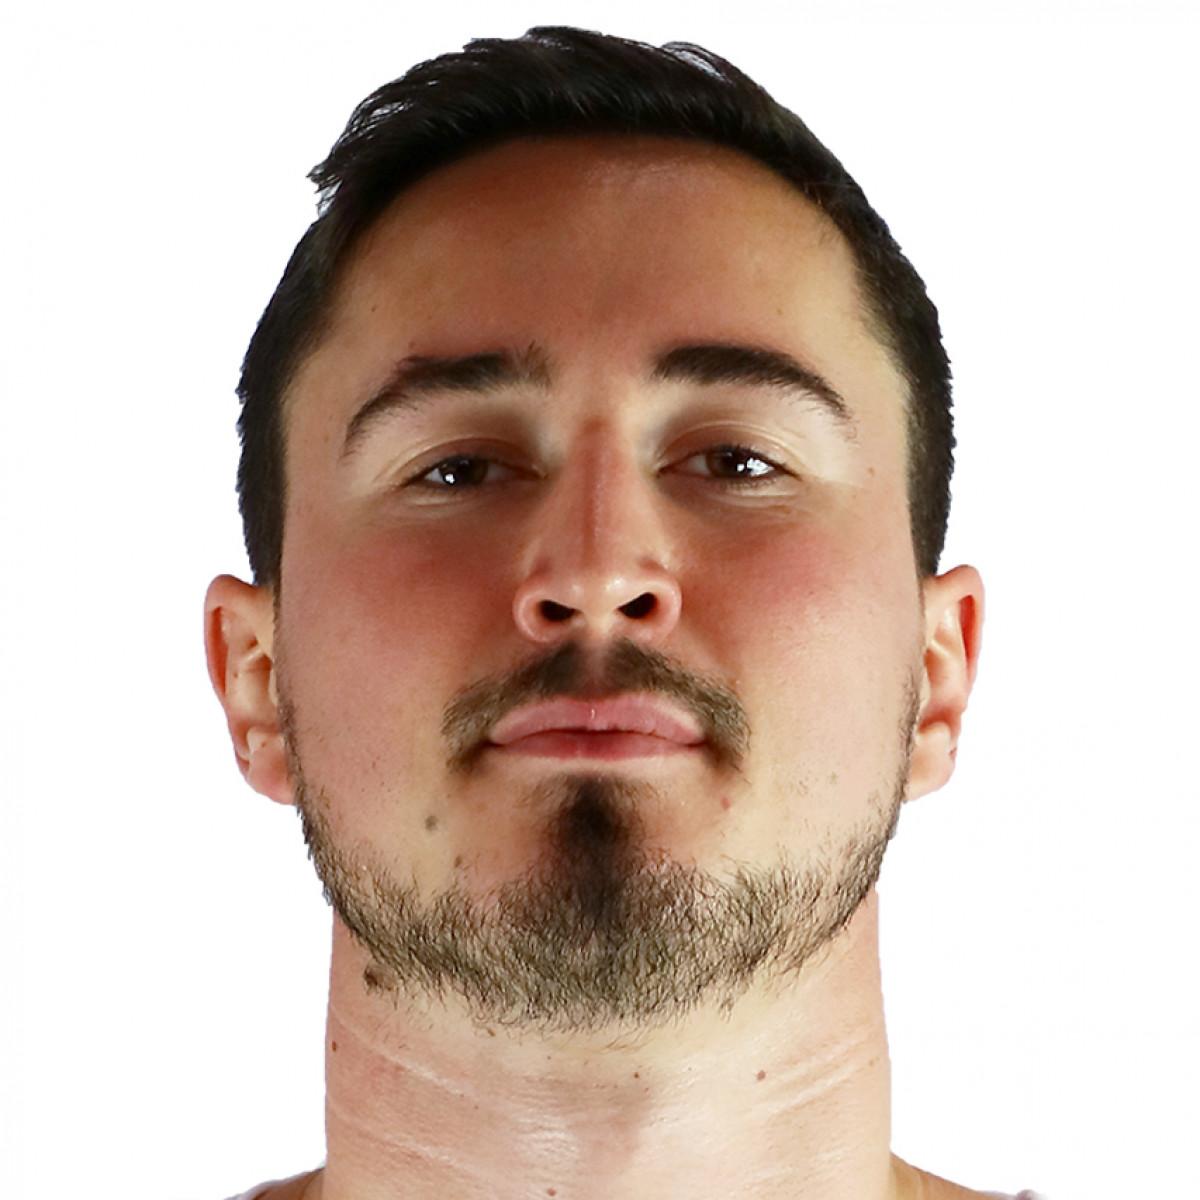 Stefan Pot